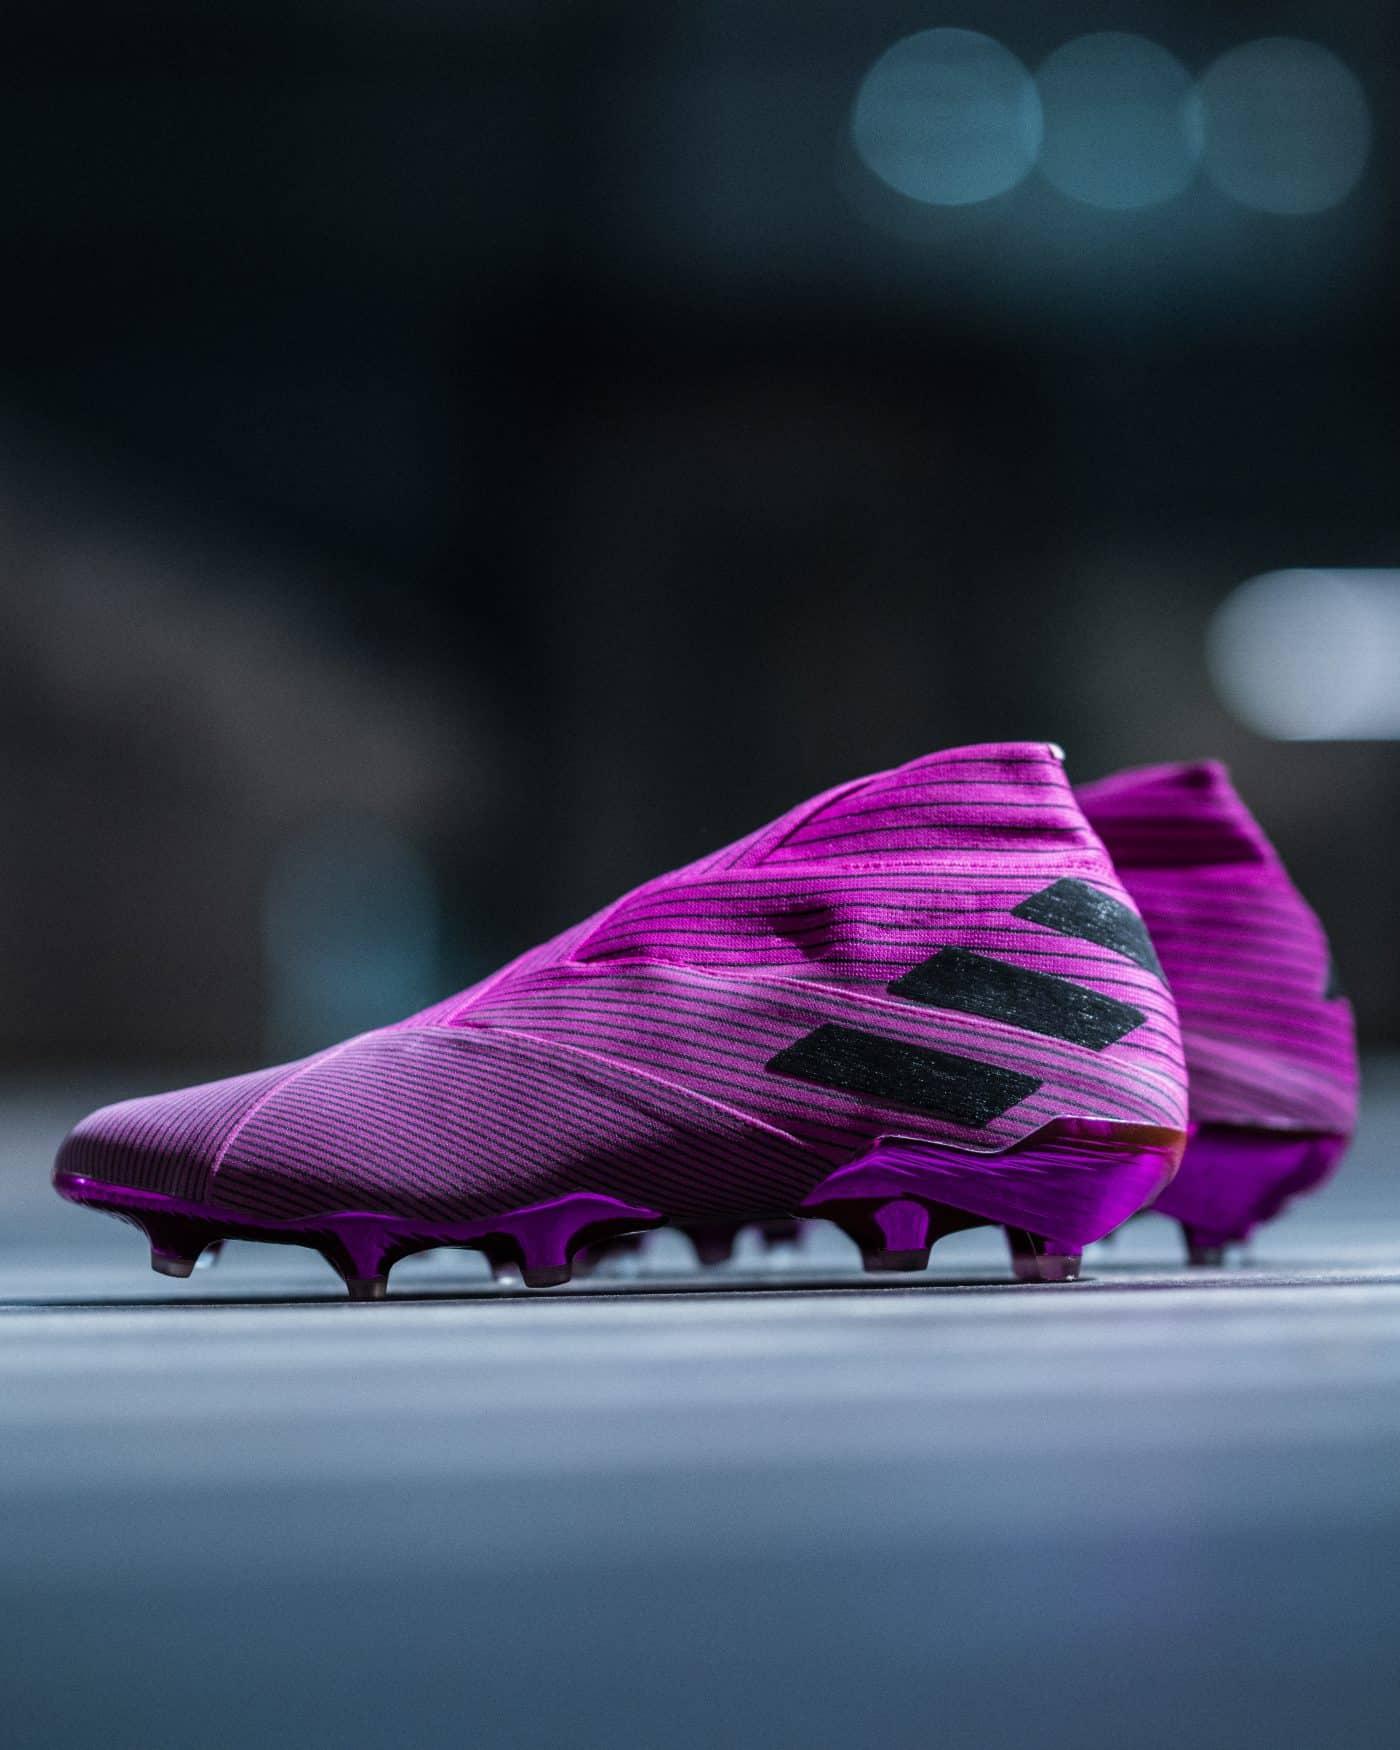 adidas-nemeziz-19-pack-hard-wired-juillet-2019-1